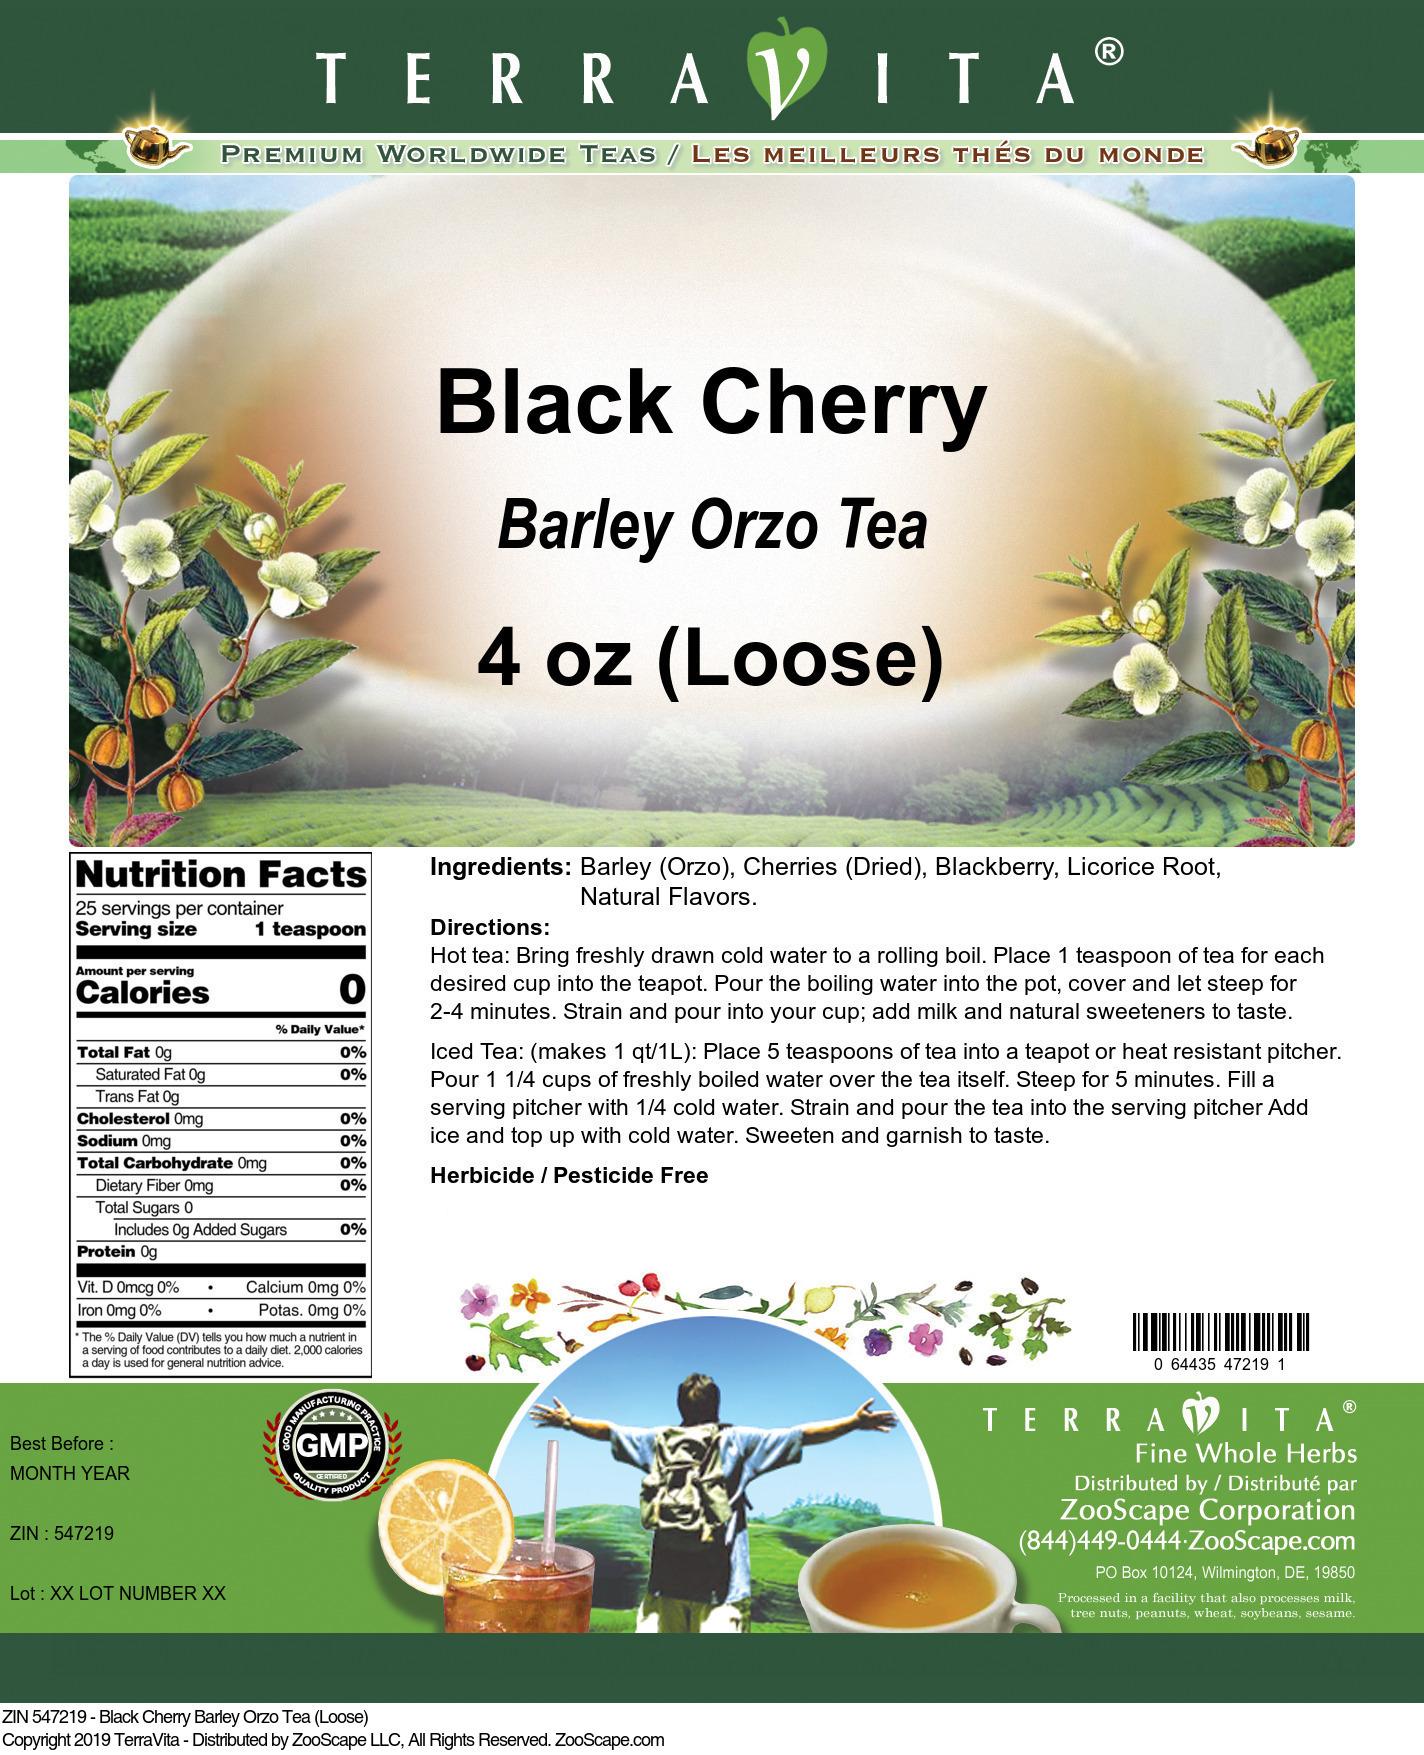 Black Cherry Barley Orzo Tea (Loose)